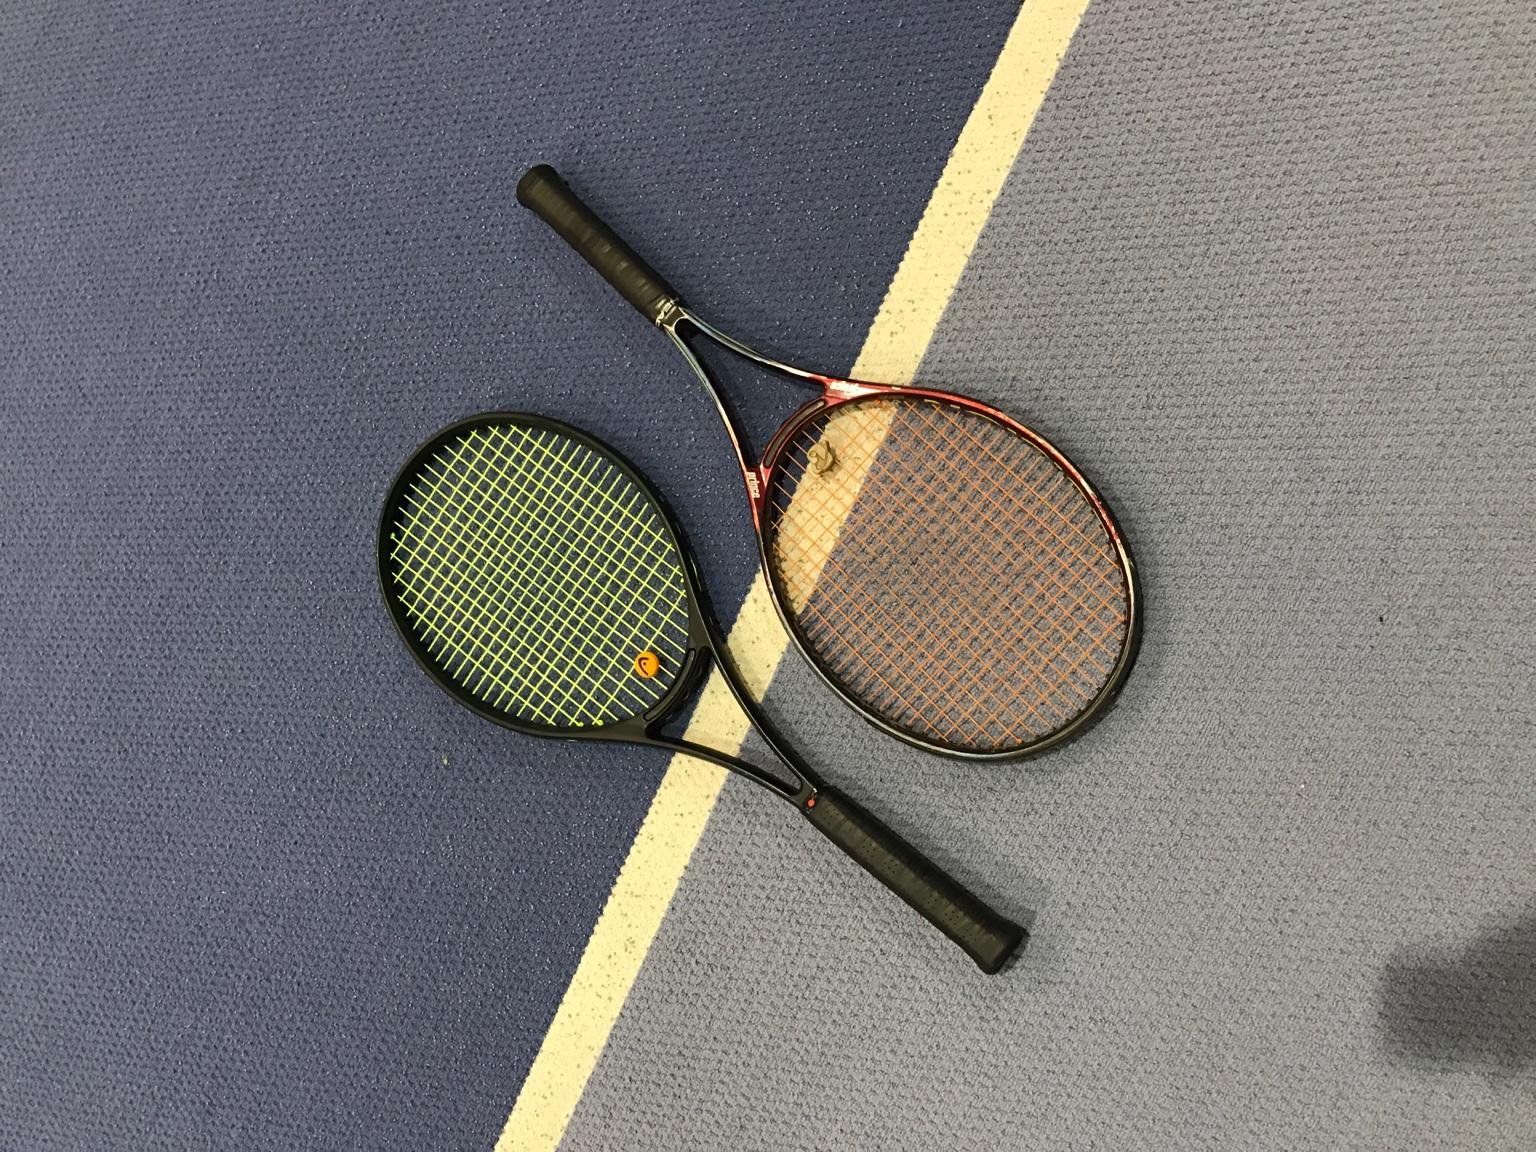 Tennis Bumper Guard : Prince precision response grommets talk tennis